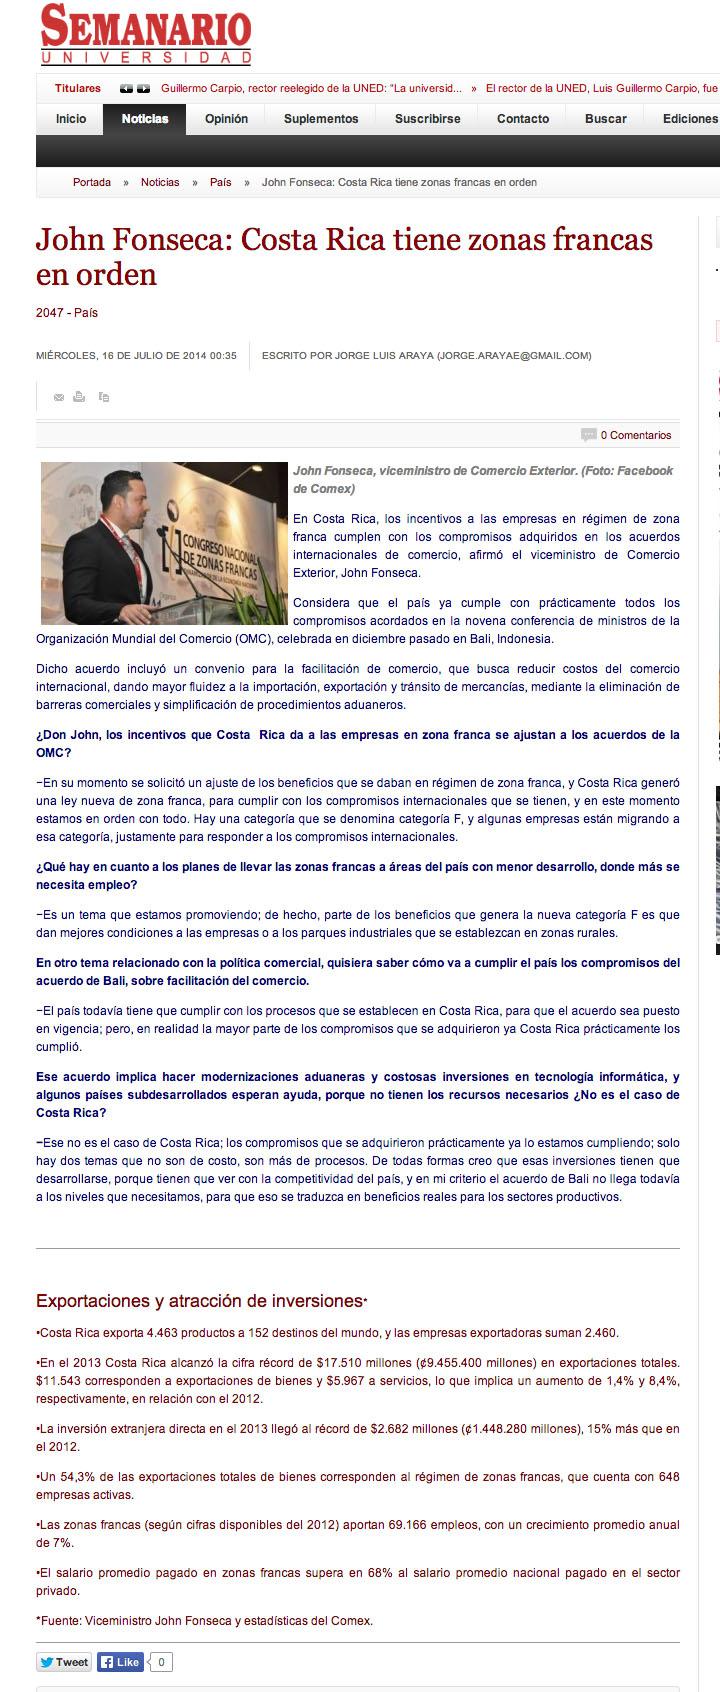 AZOFRAS 160714 Semanario1